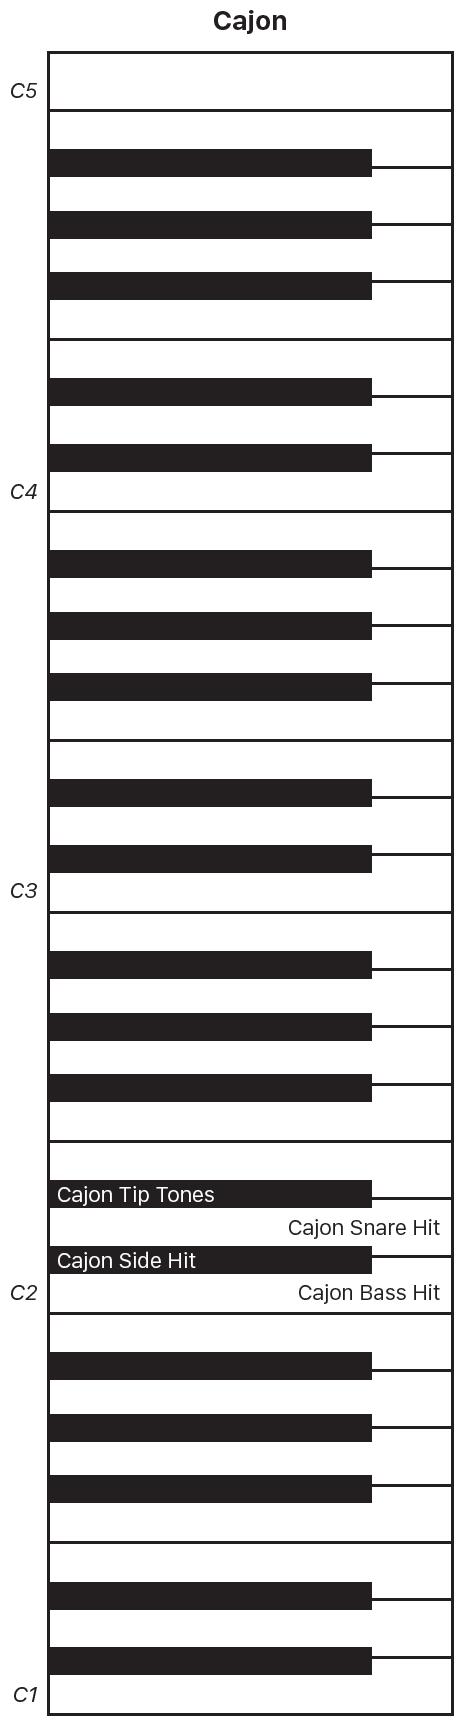 Figure. Cajon performance keyboard map.